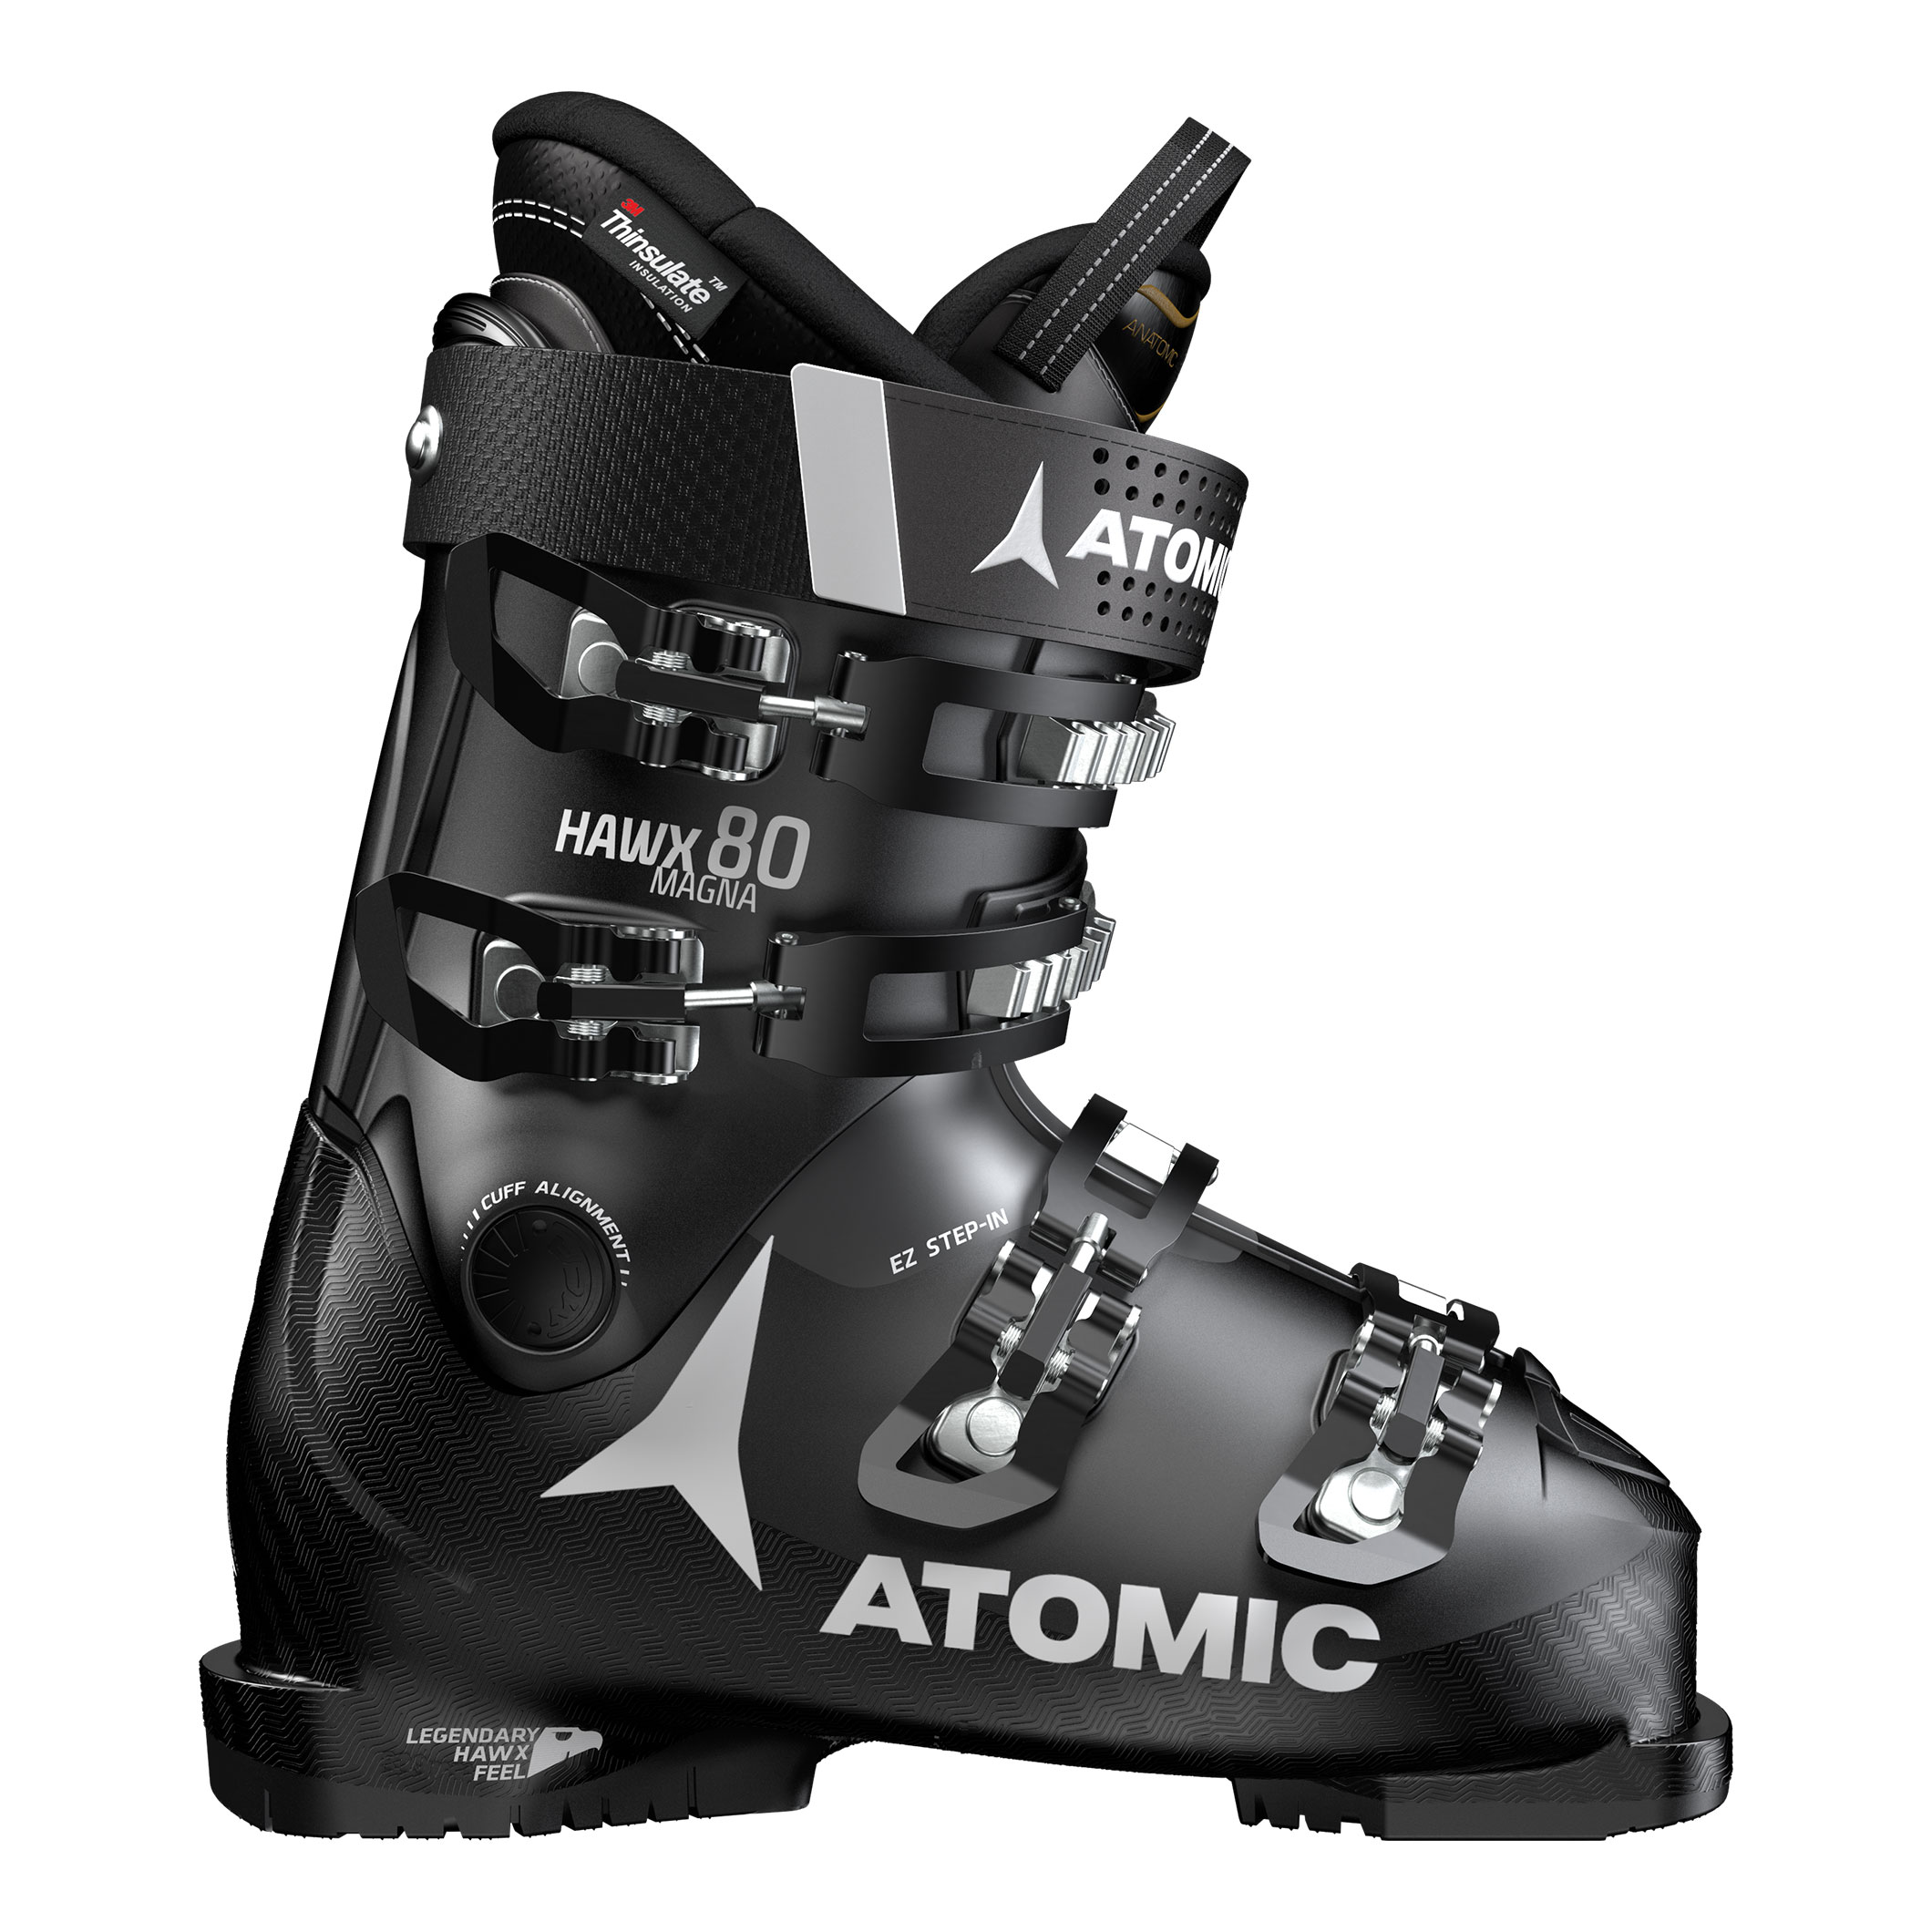 Lyžiarky ATOMIC Hawx Magna 80 Black / Anthracite - 18/19 Čierna 30.0/30.5